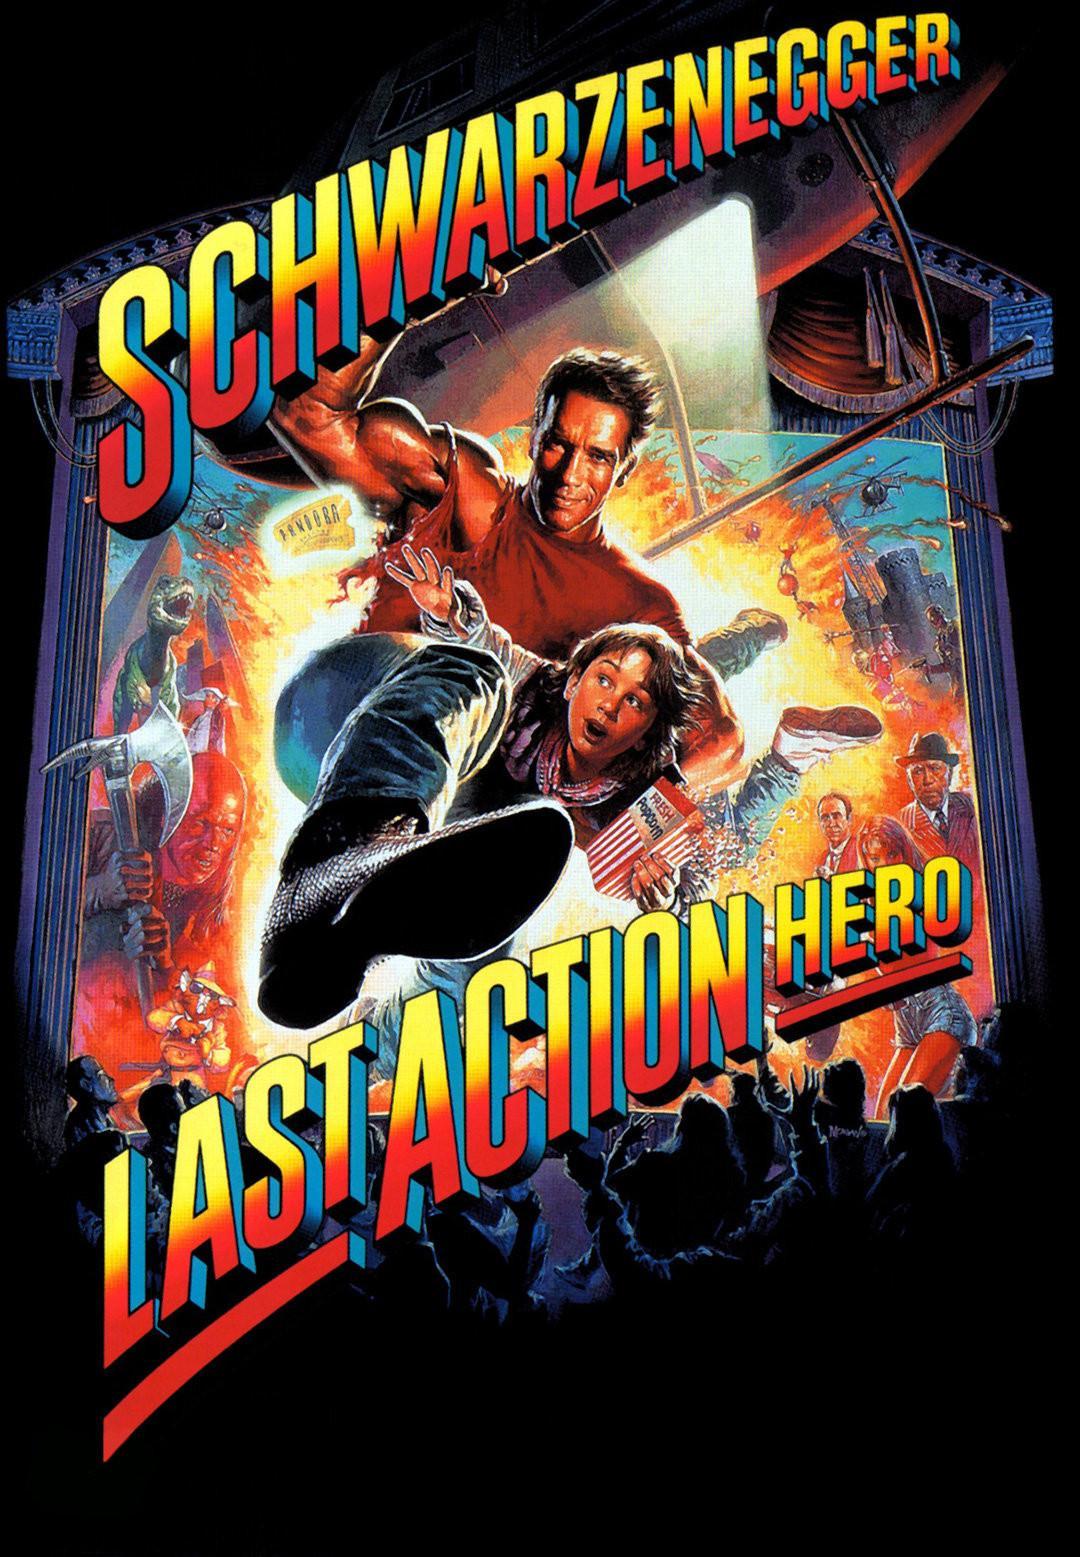 last action zero ultimo gran heroe